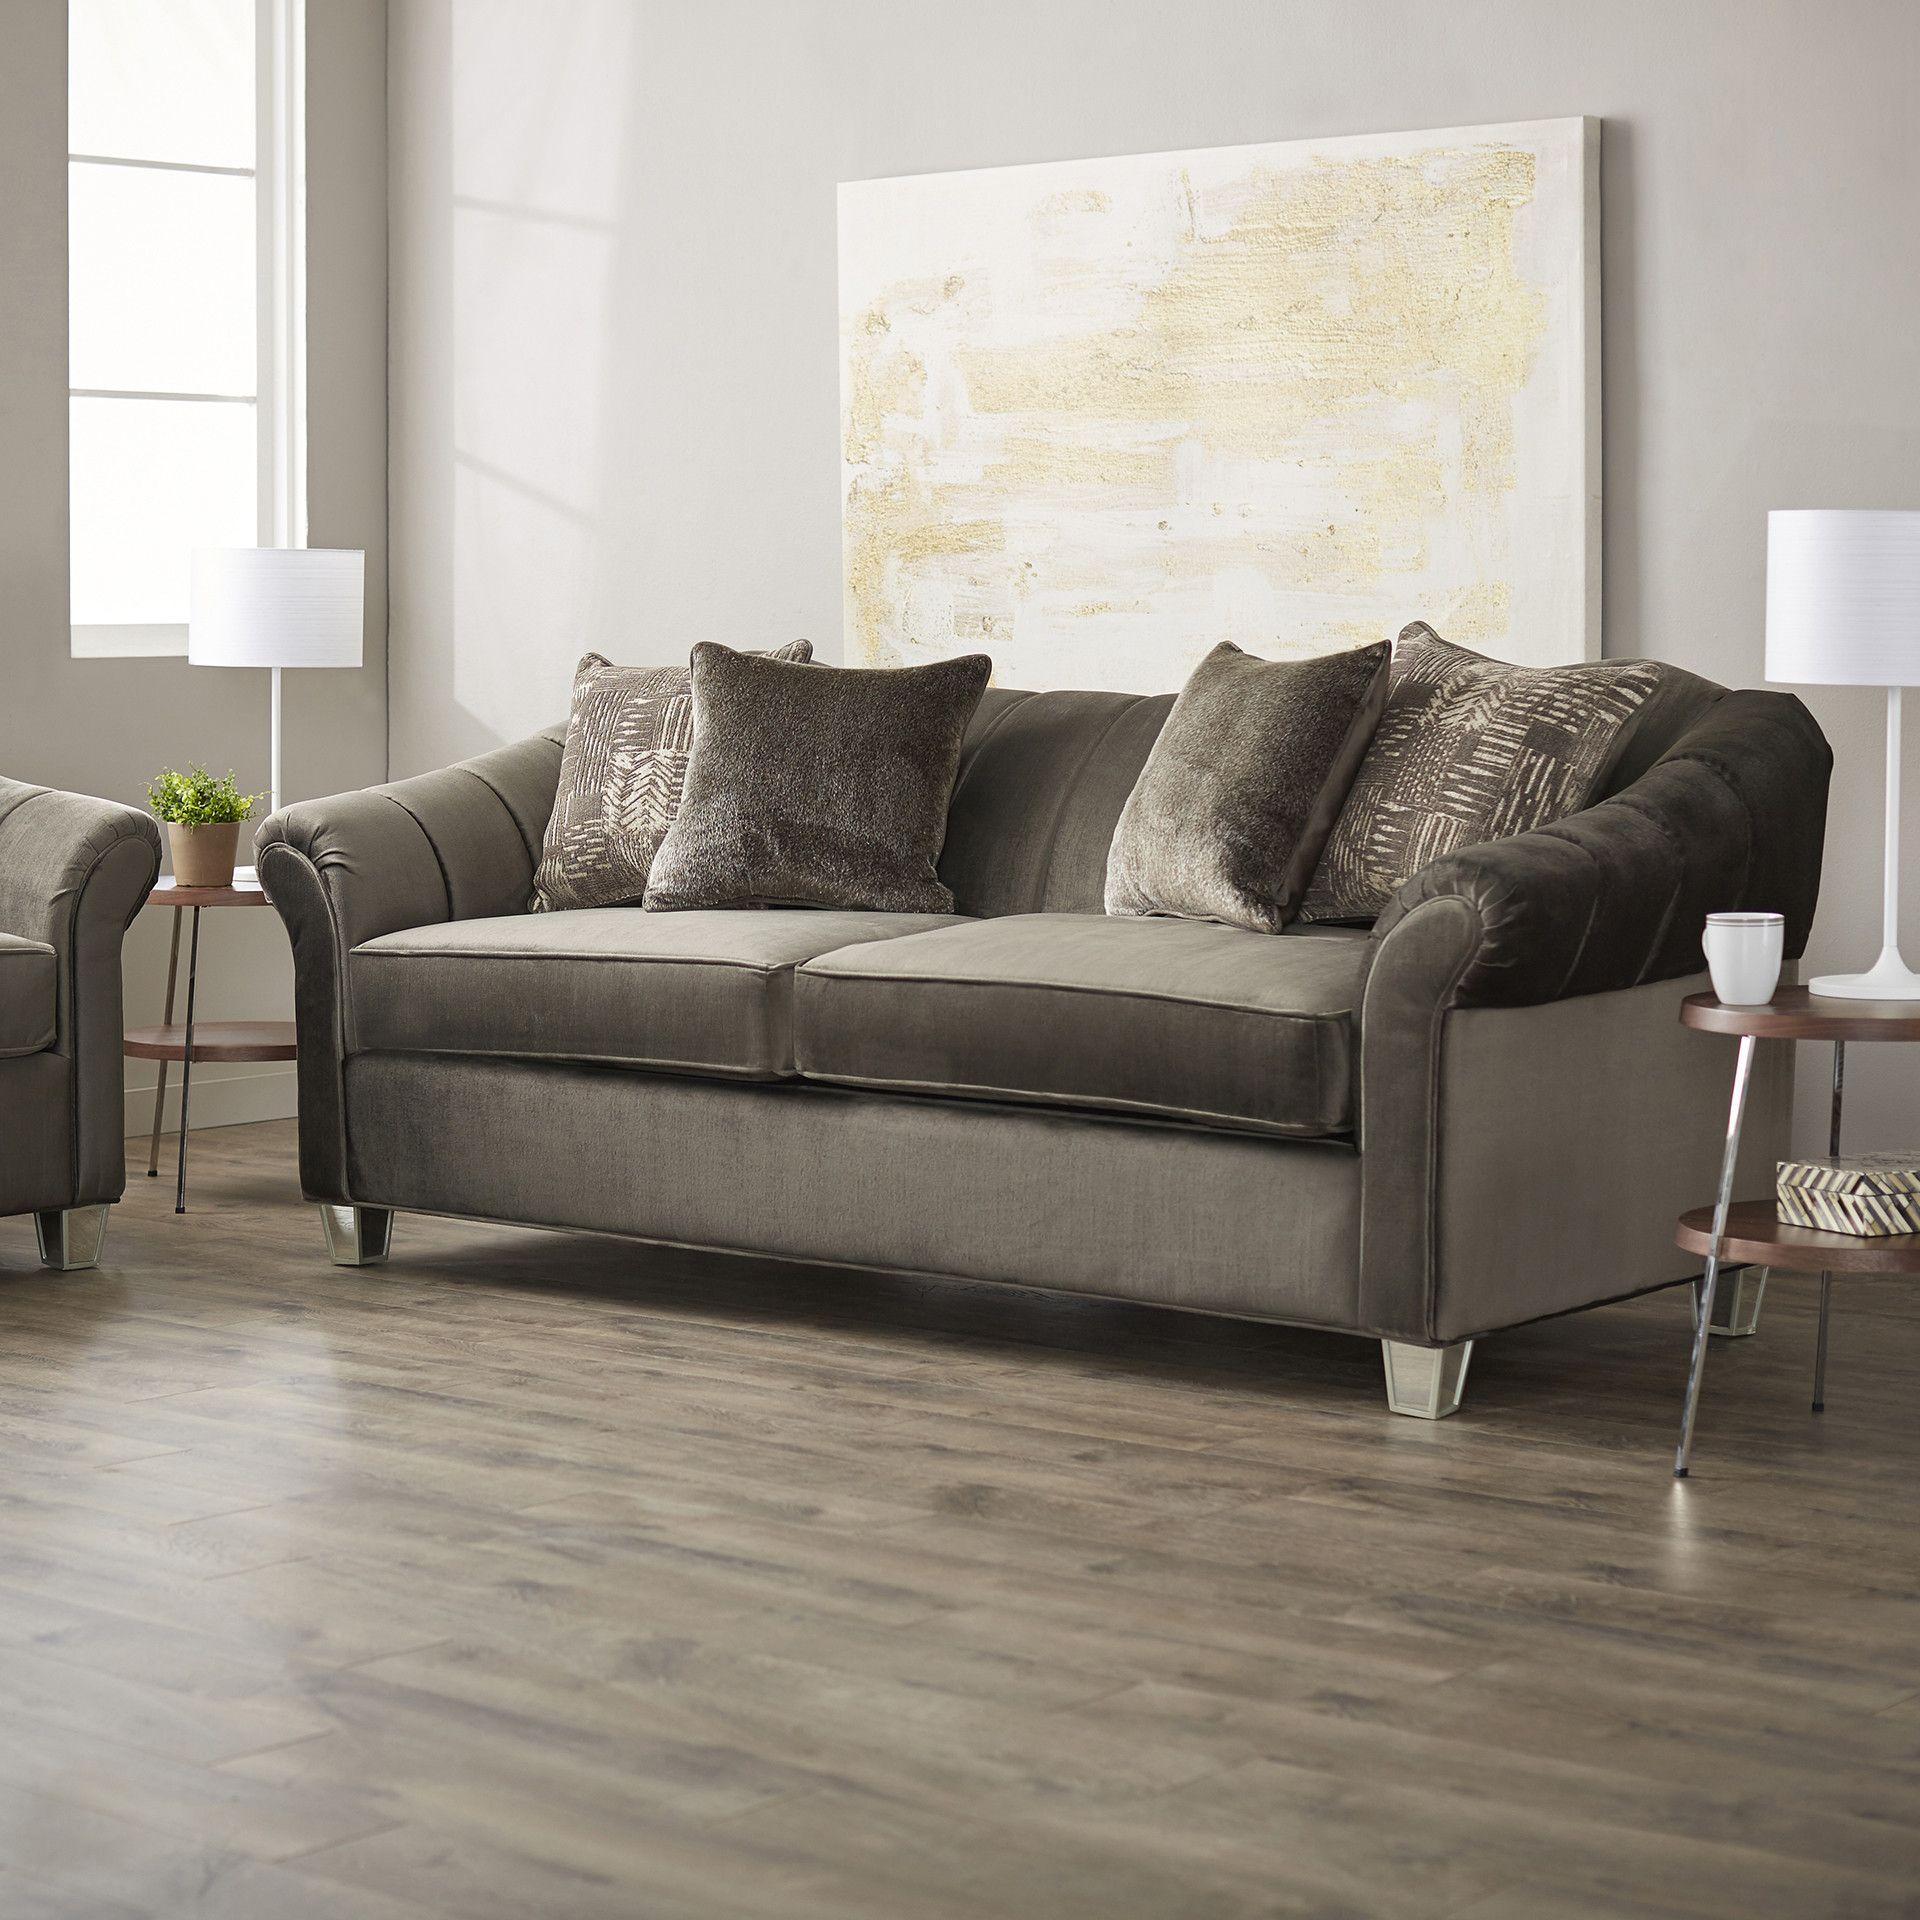 house of hampton millie 87 sofa apartment style pinterest